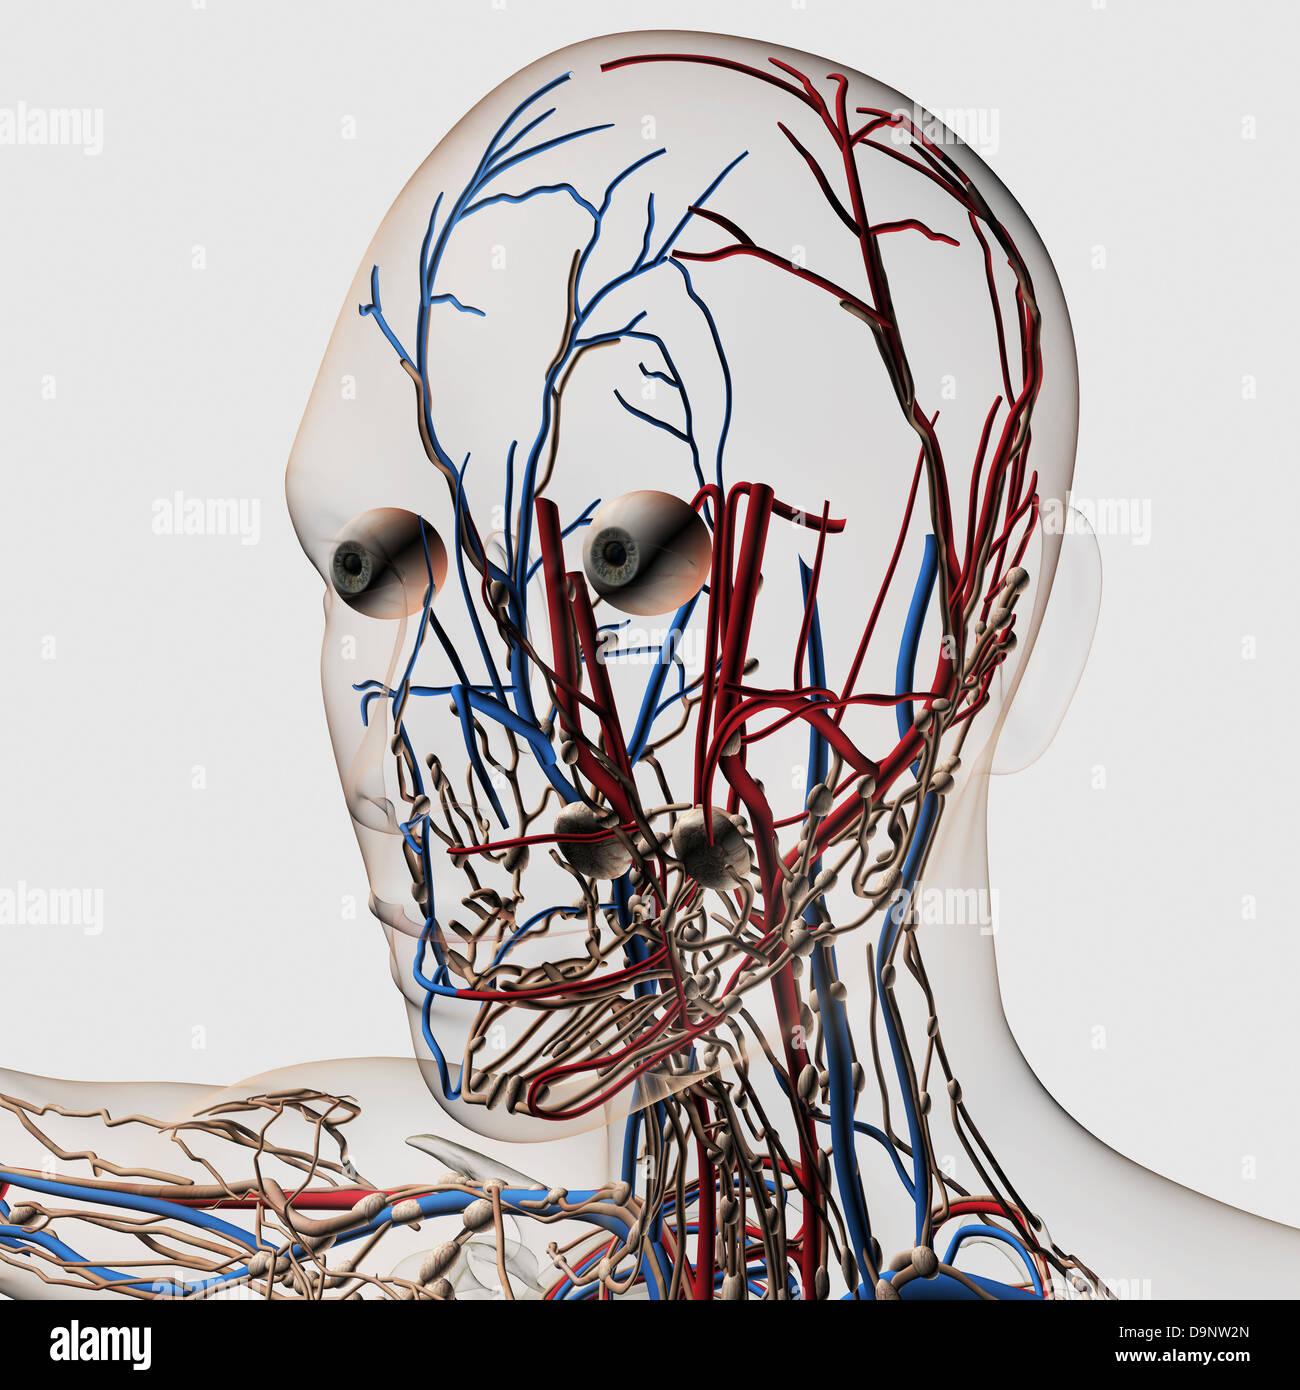 c8.alamy.com/compde/d9nw2n/medizinische-illustrati...